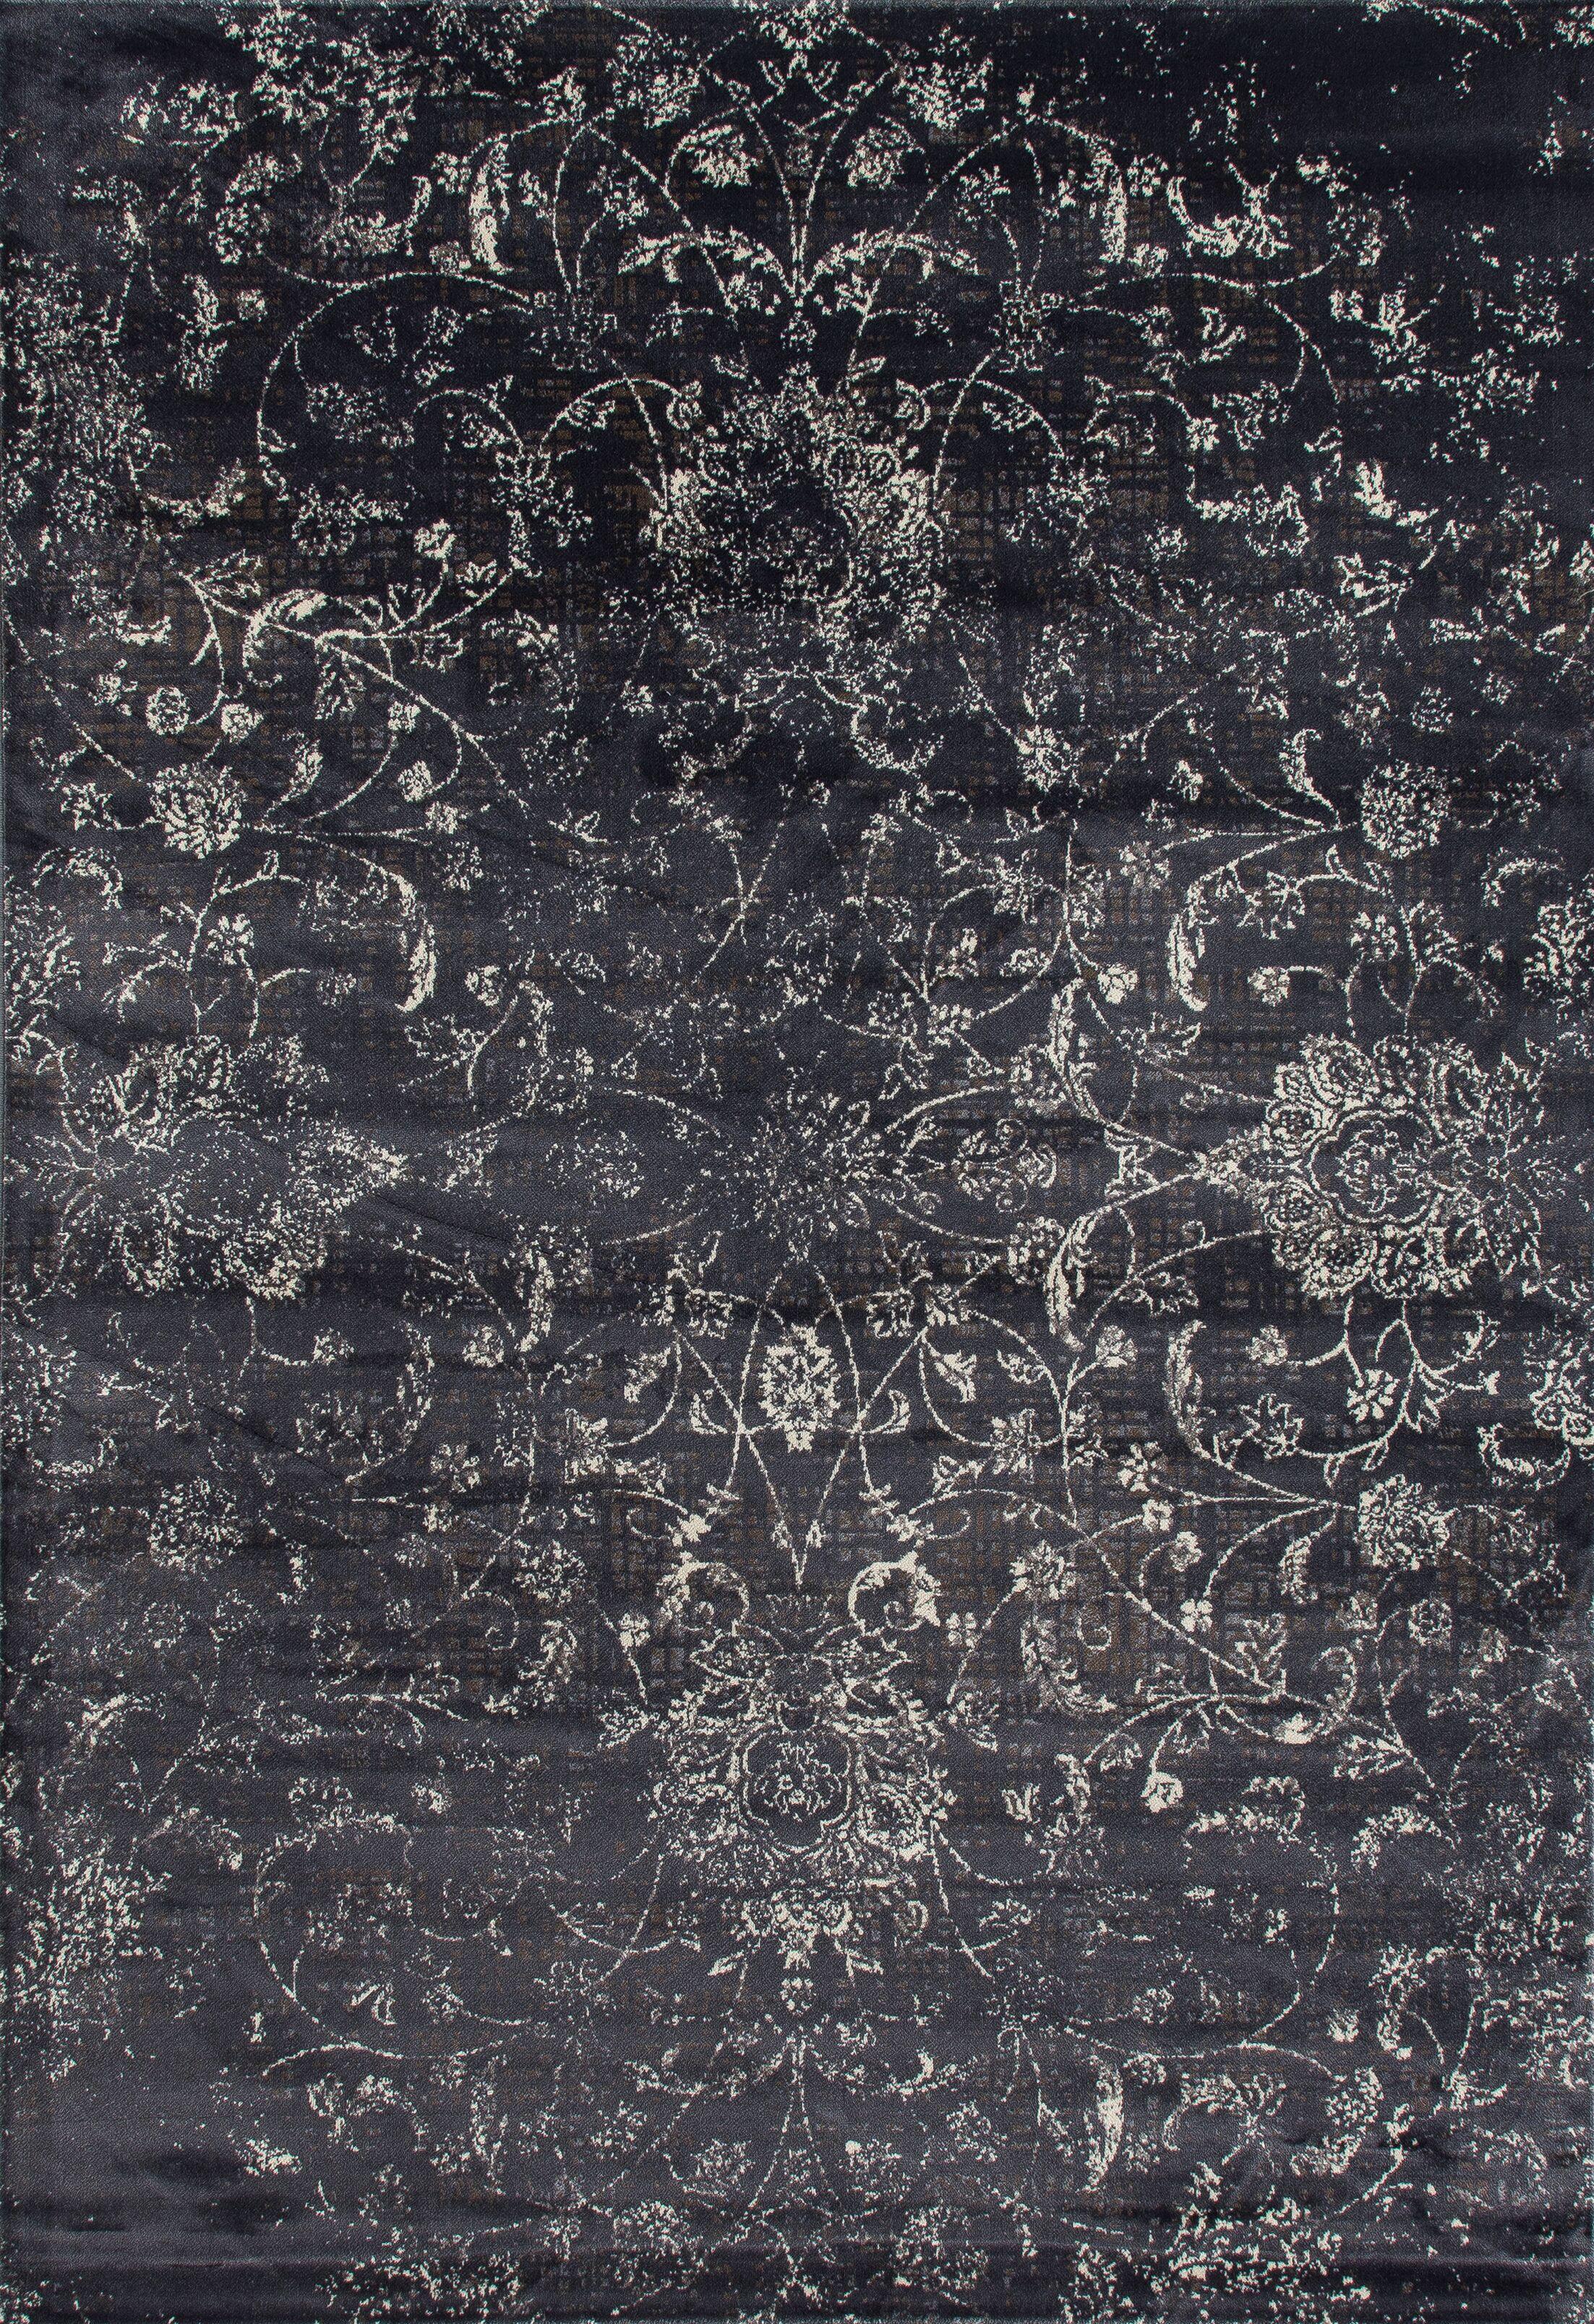 Devay Floral Gray Area Rug Rug Size: 7'10 x 11